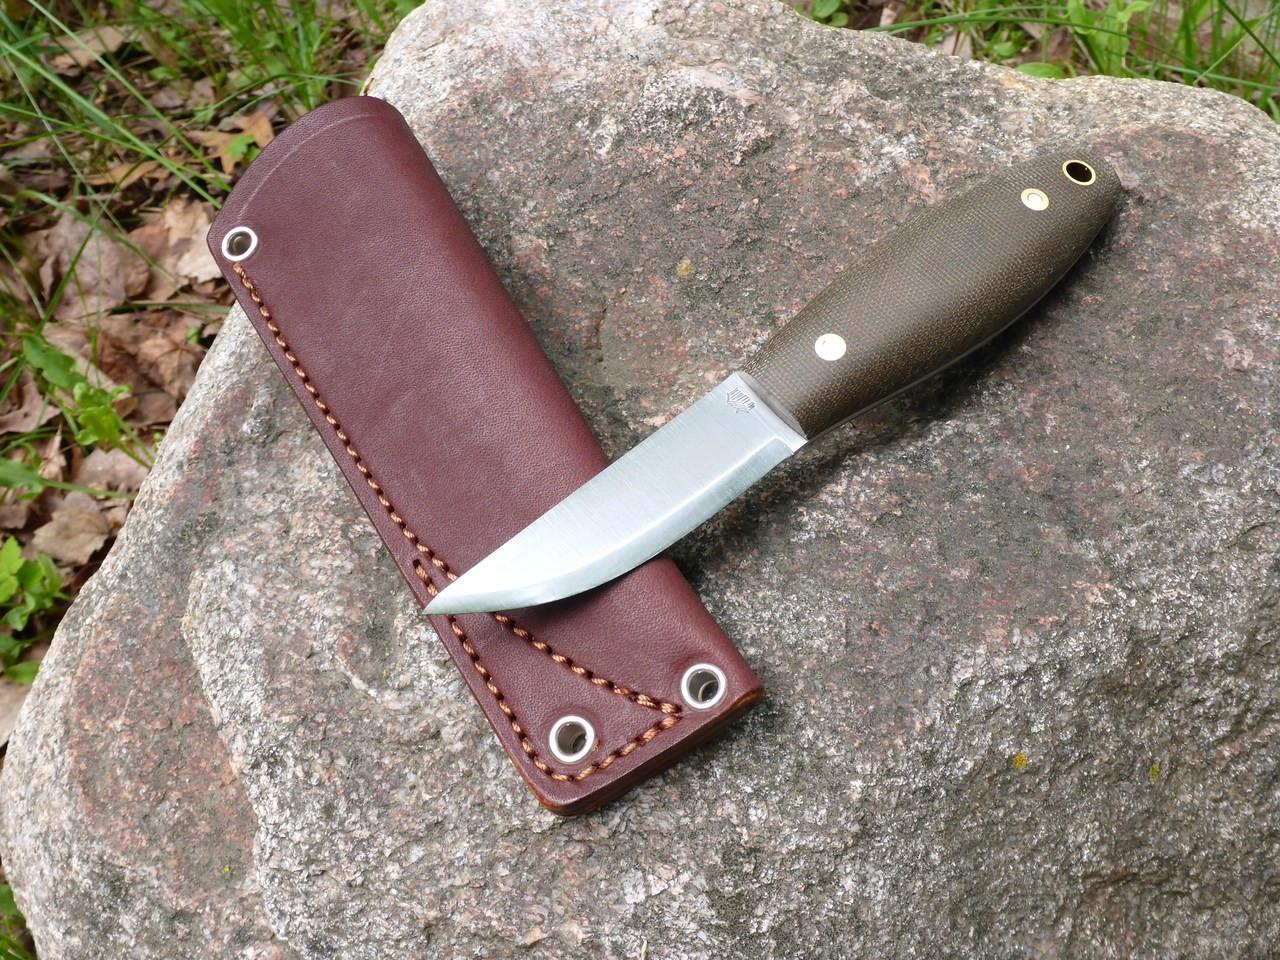 Funda para cuchillo Manly. P1020833__29377.1527698785.1280.1280